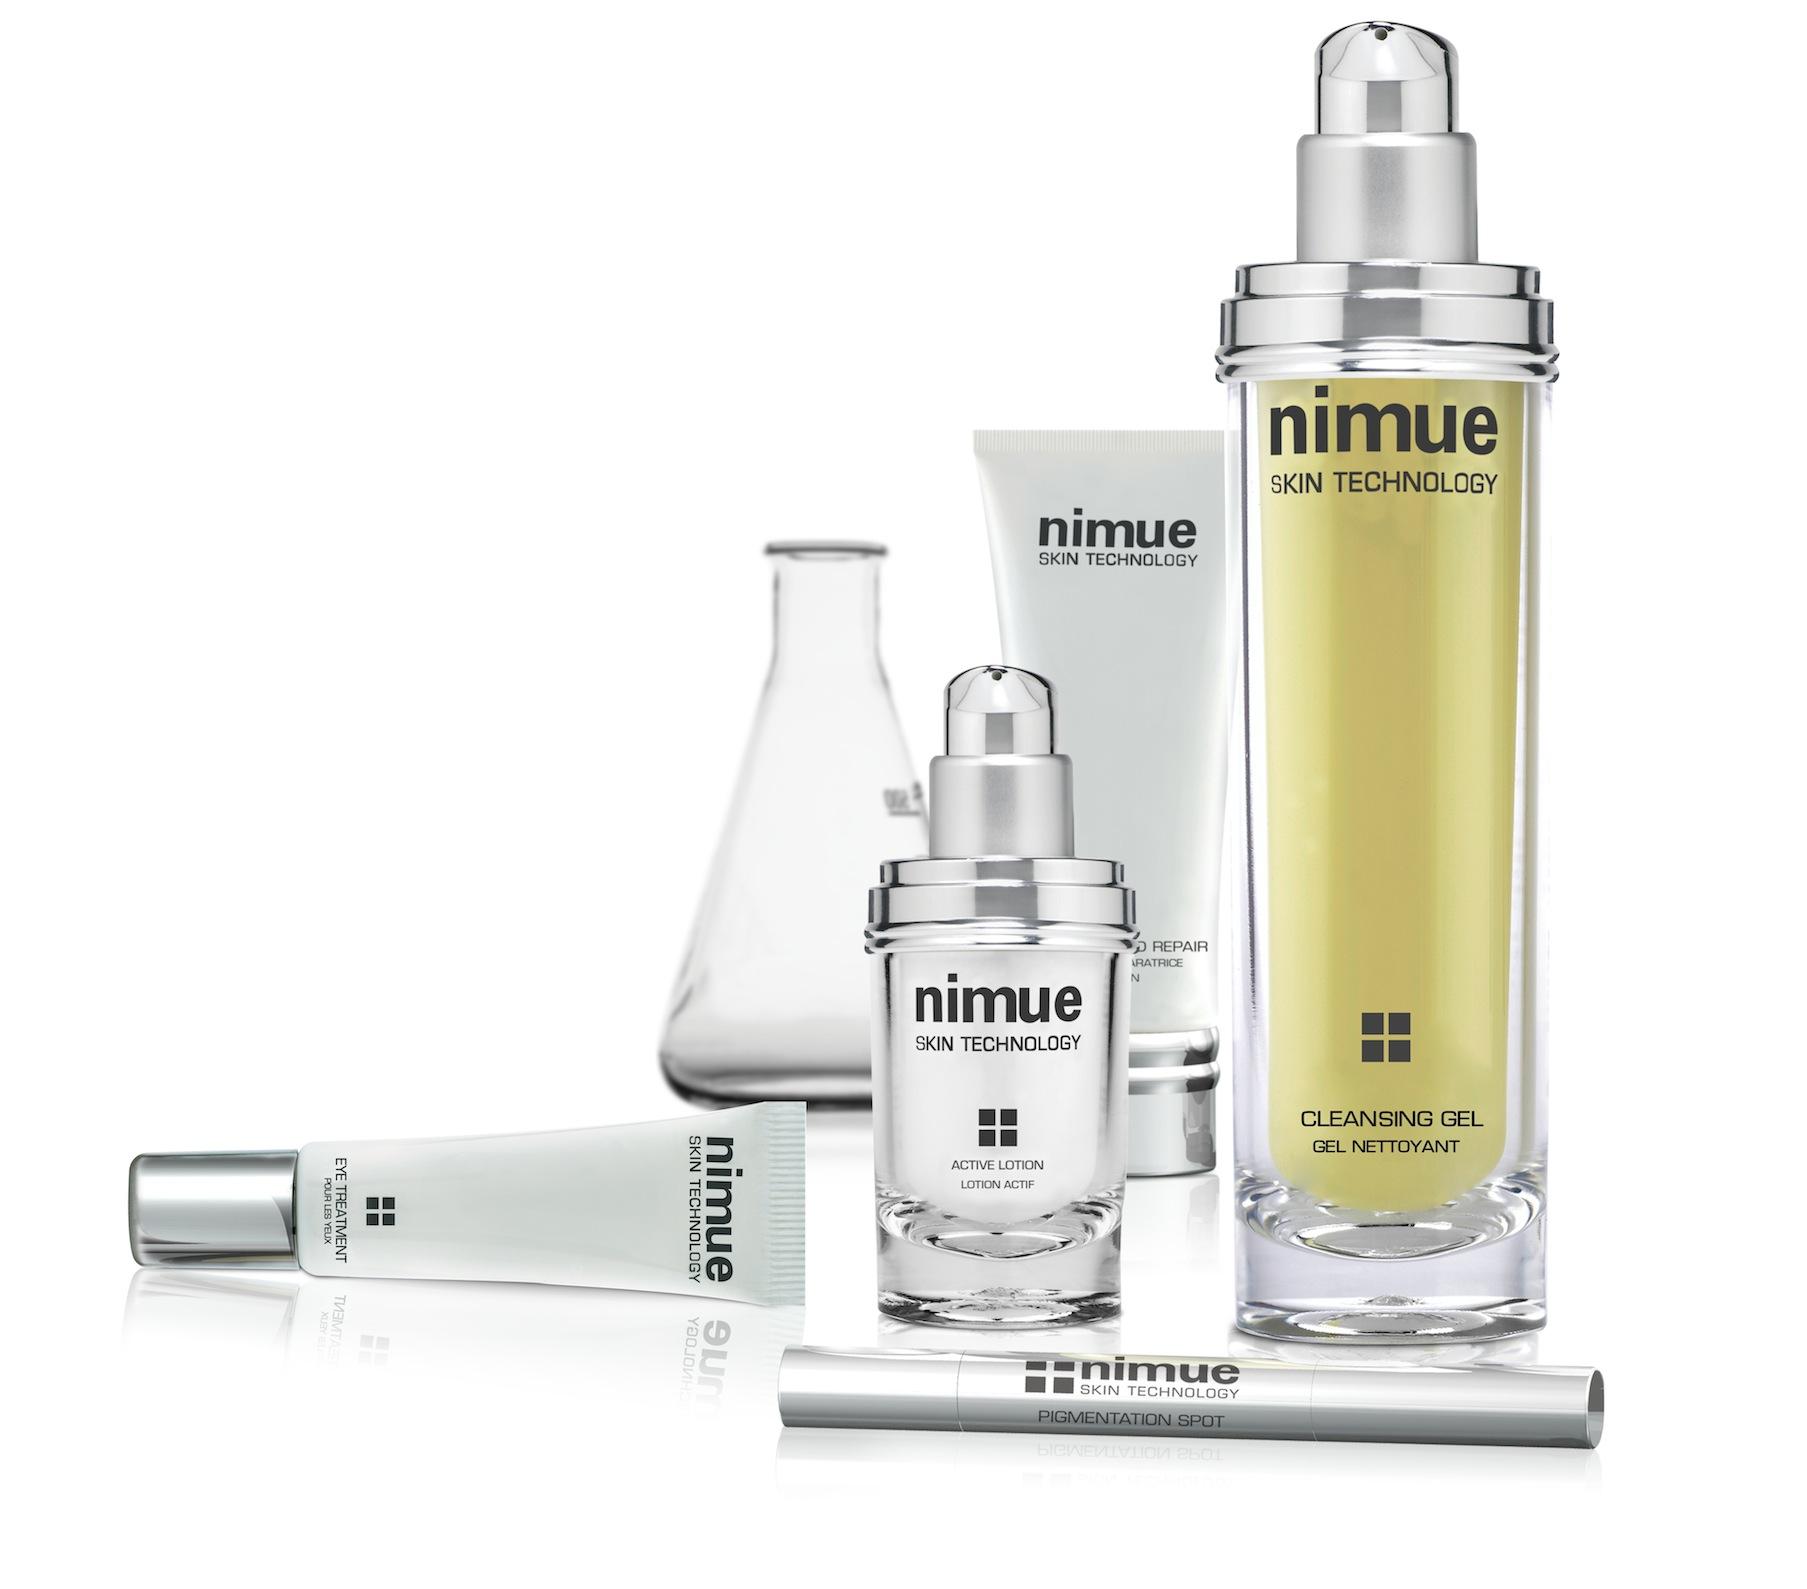 nimue online shop